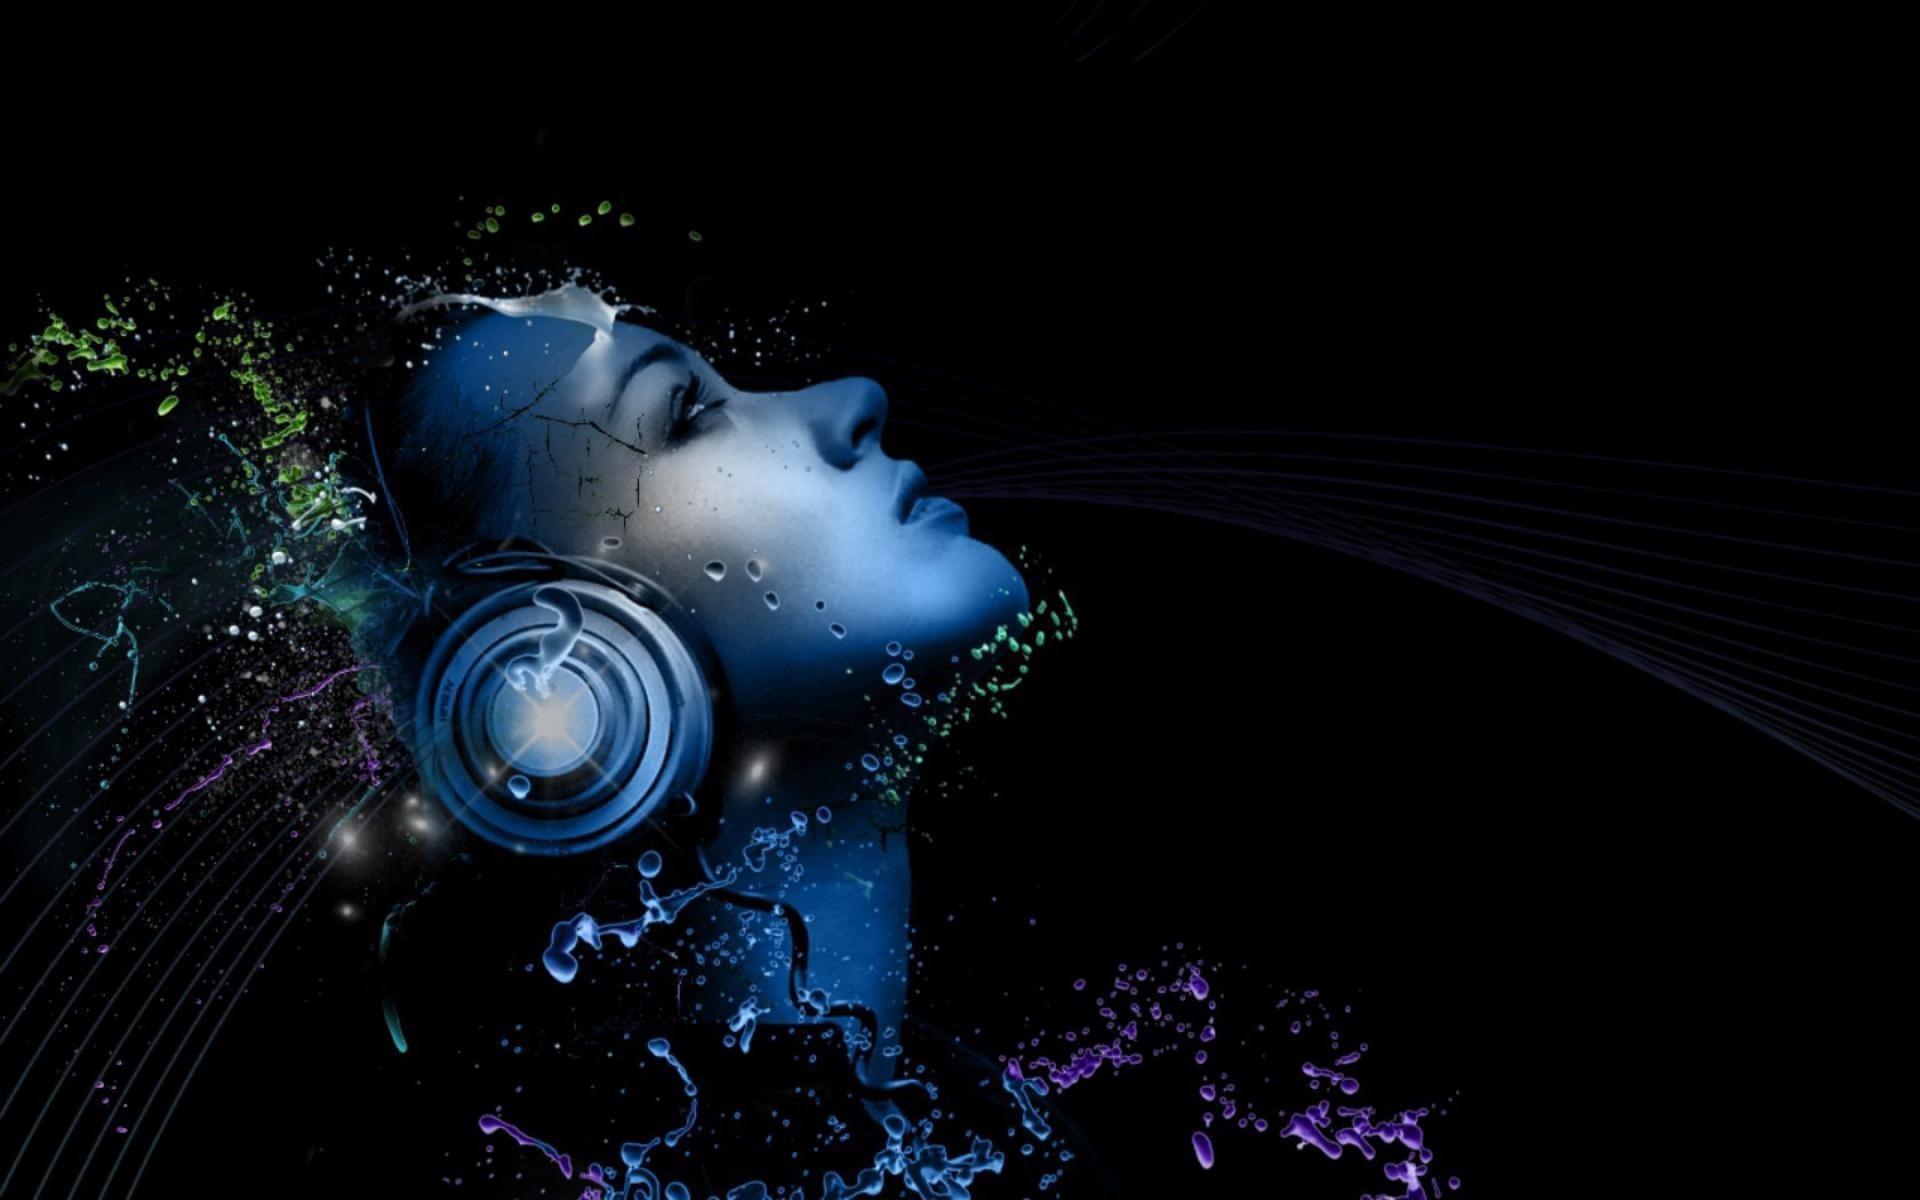 wallpaper headphones light music images 1920×1200